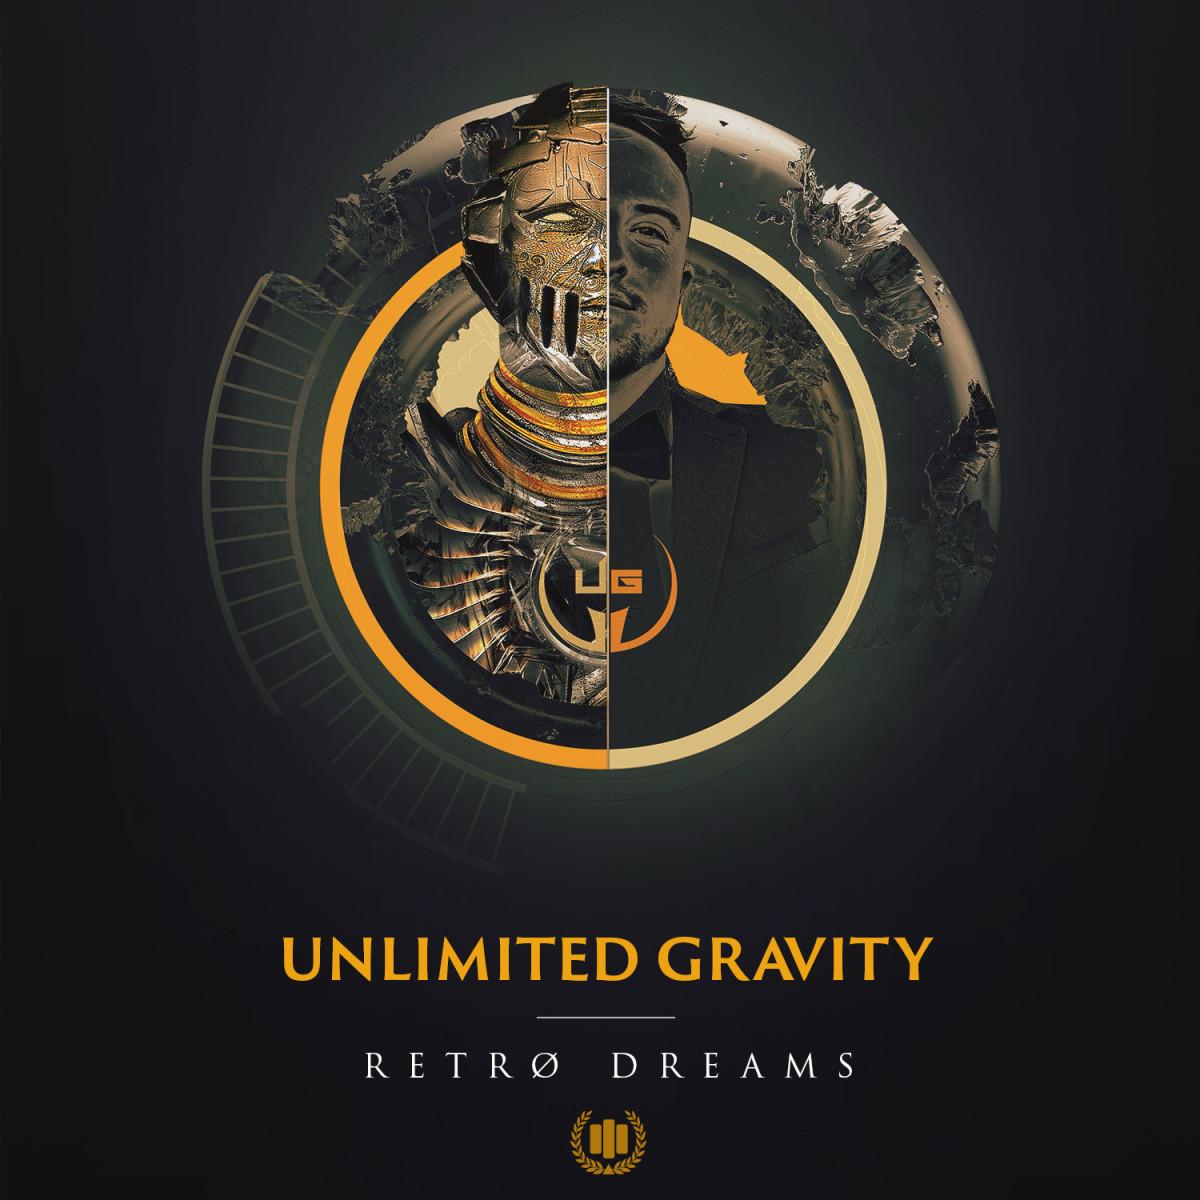 Unlimited Gravity - Retro Dreams (Demigod Pt 1)